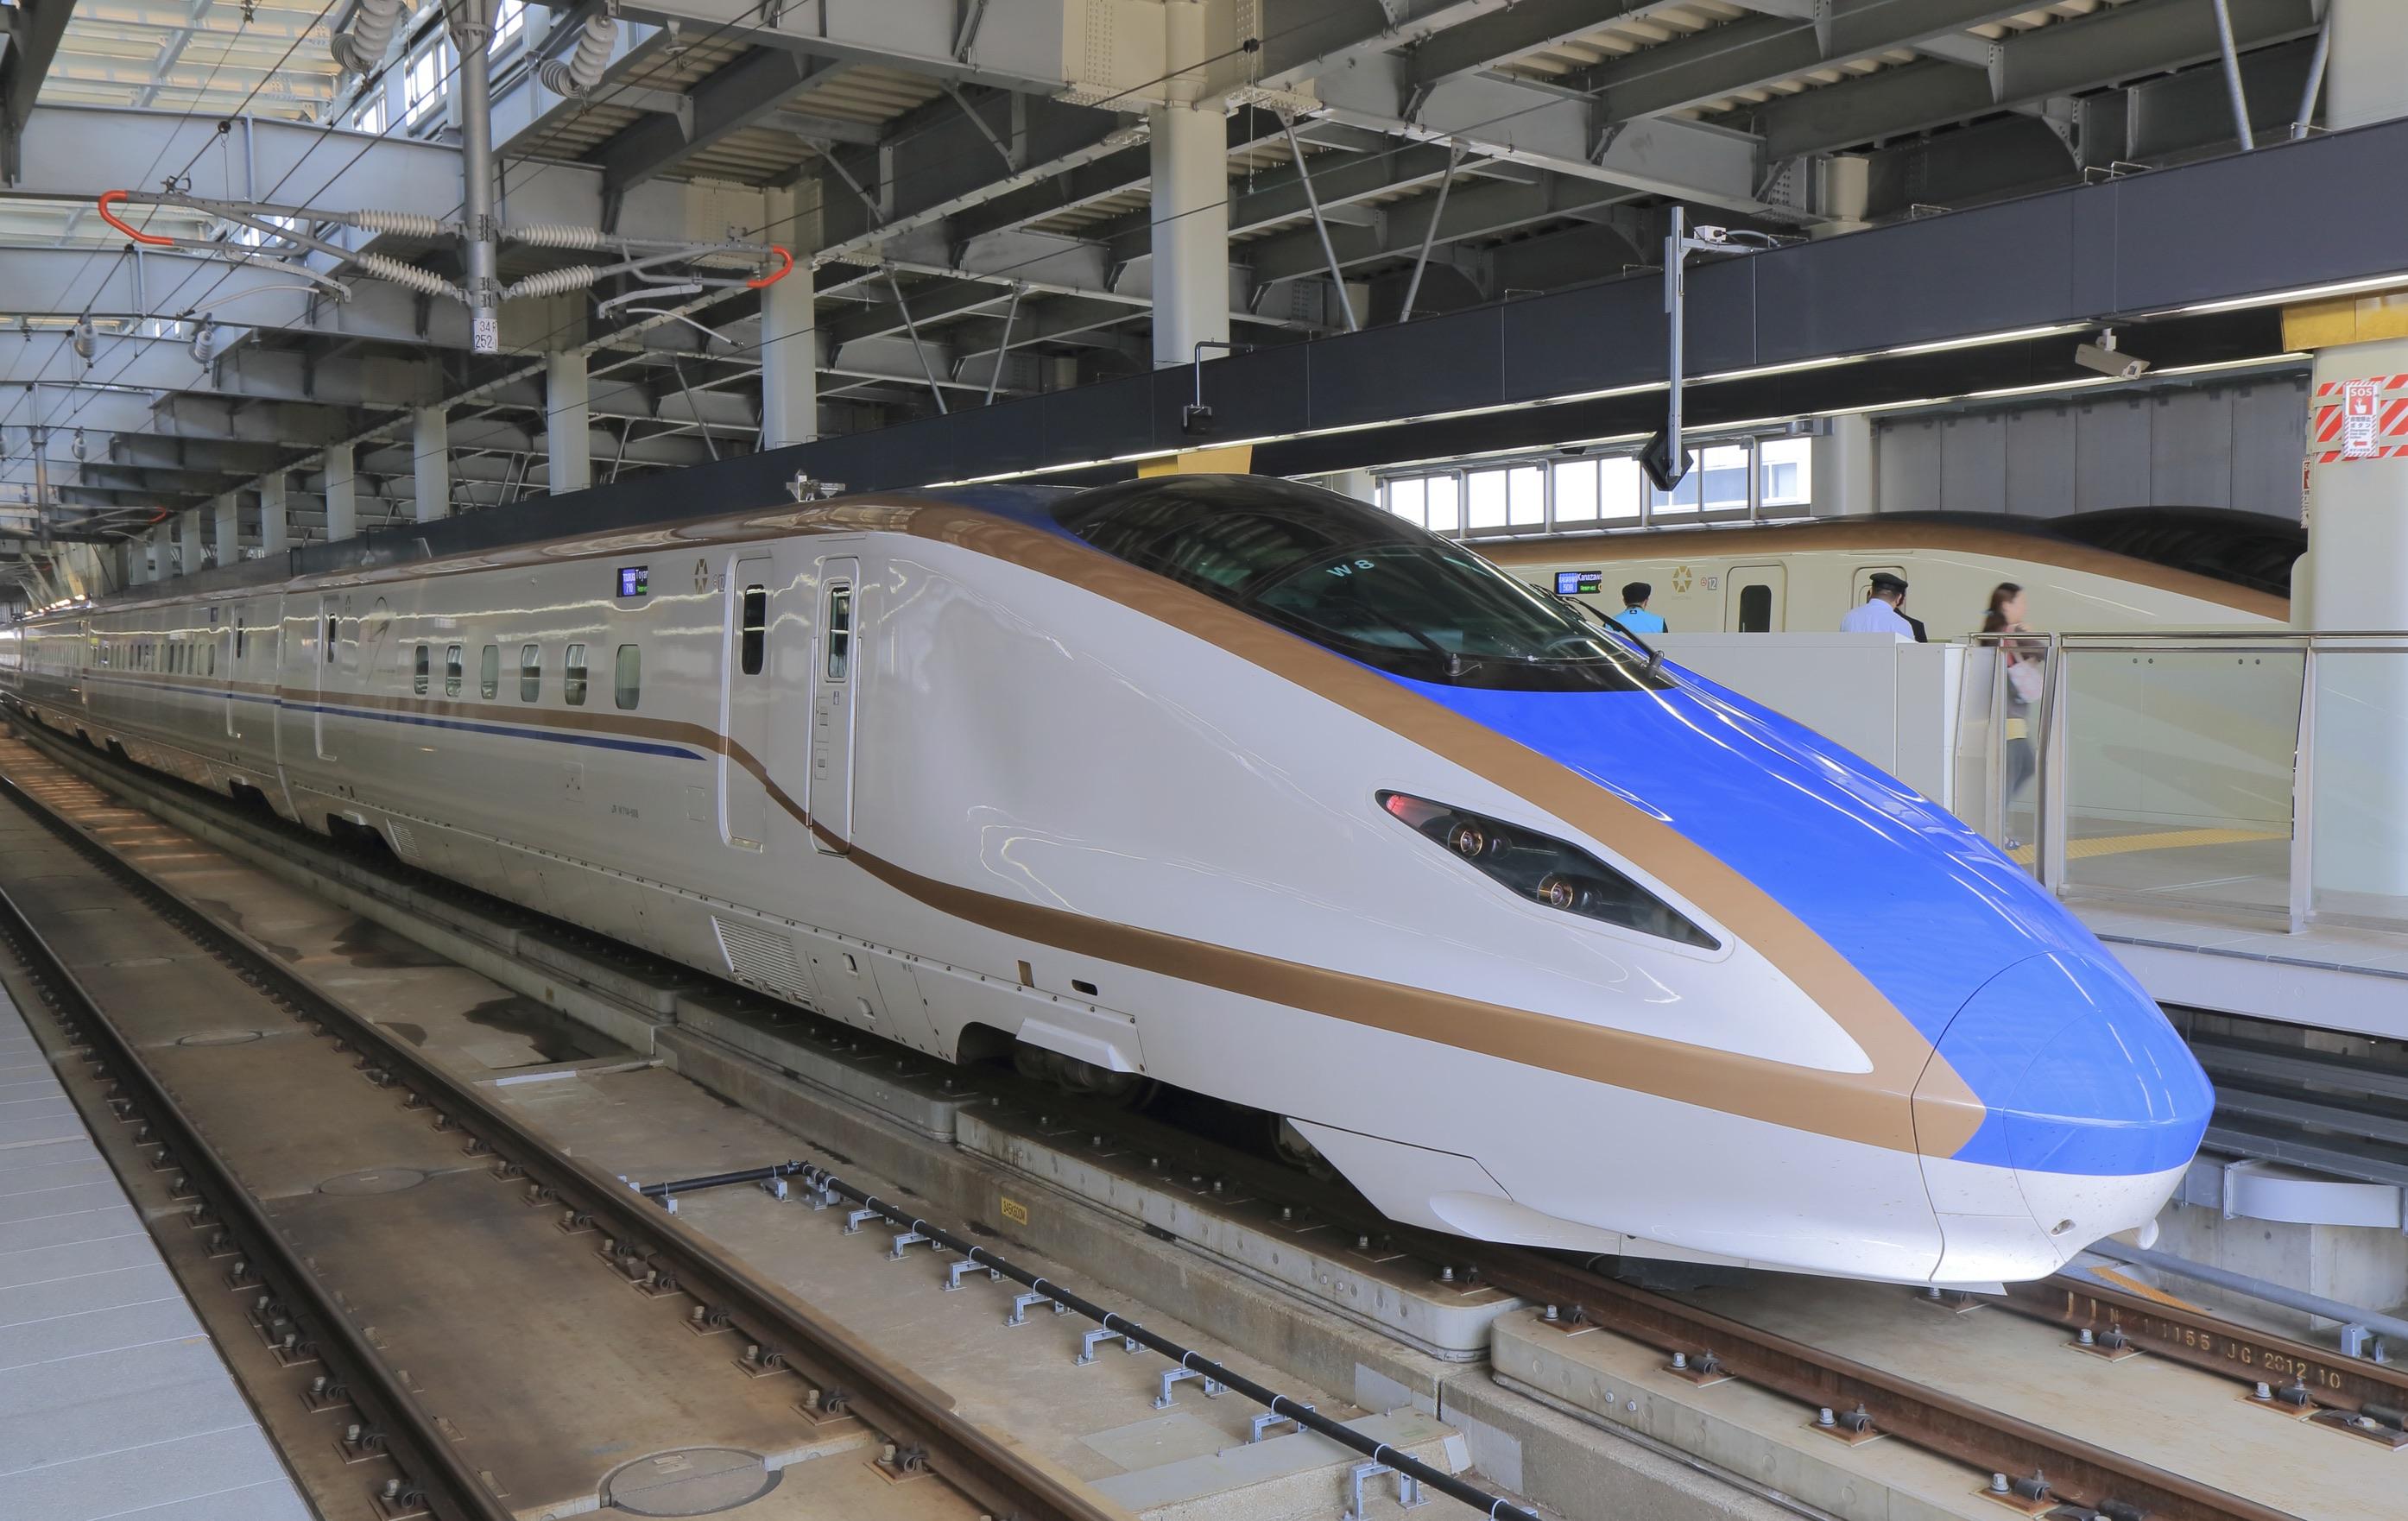 Kanazawa Japan - May 10, 2015: Modern Hokuriku Sinkansen bullet train parked at Kanazawa station in Kanazawa Japan.